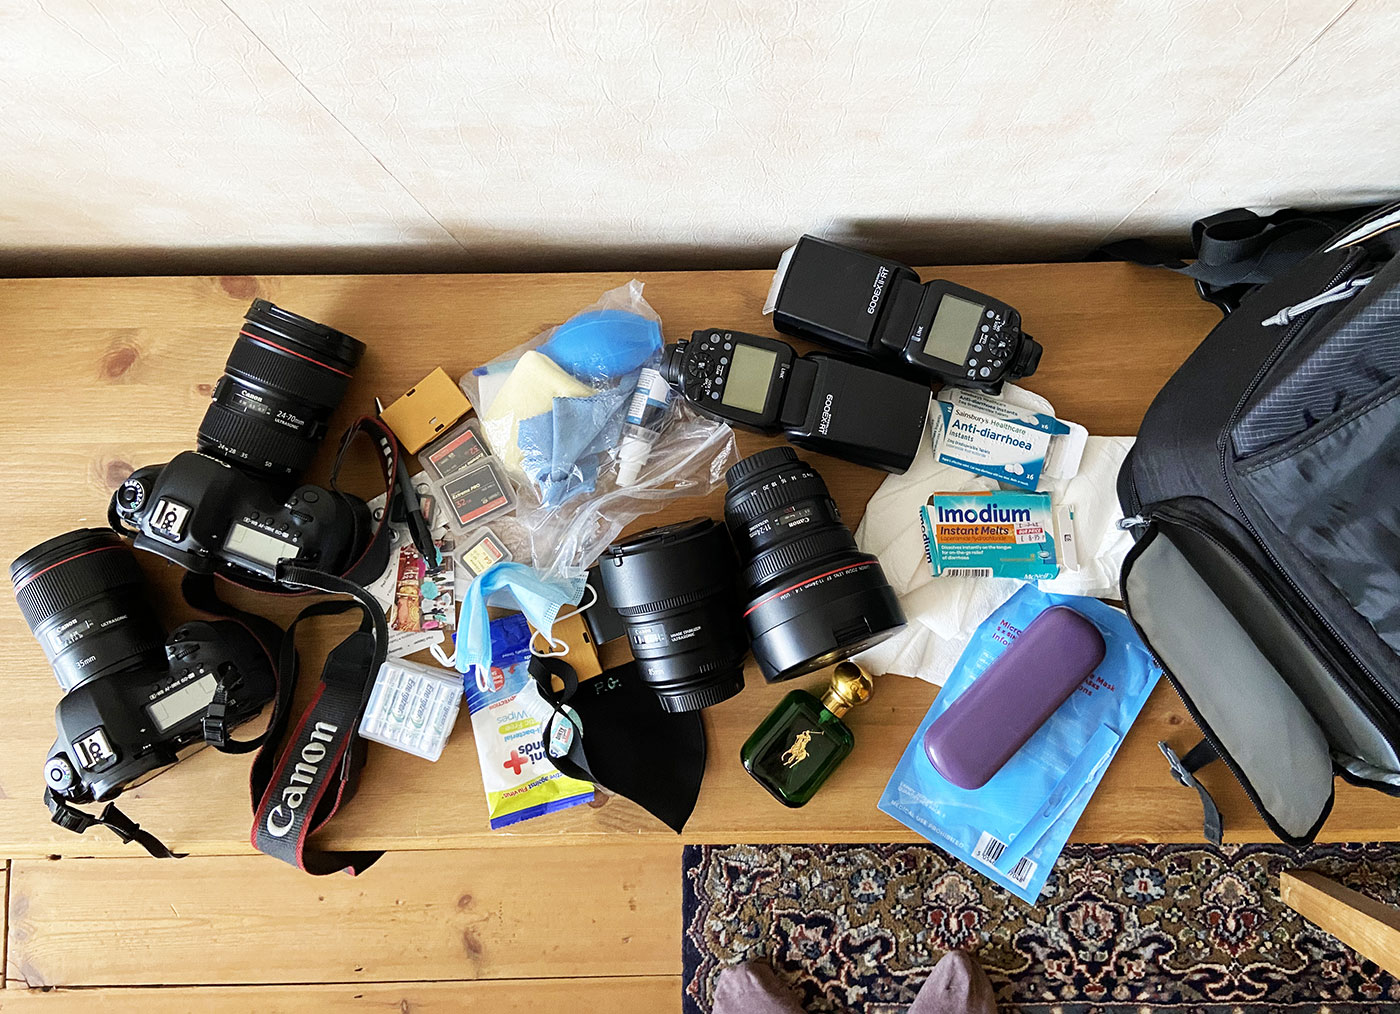 Paul Gapper Kit Bag